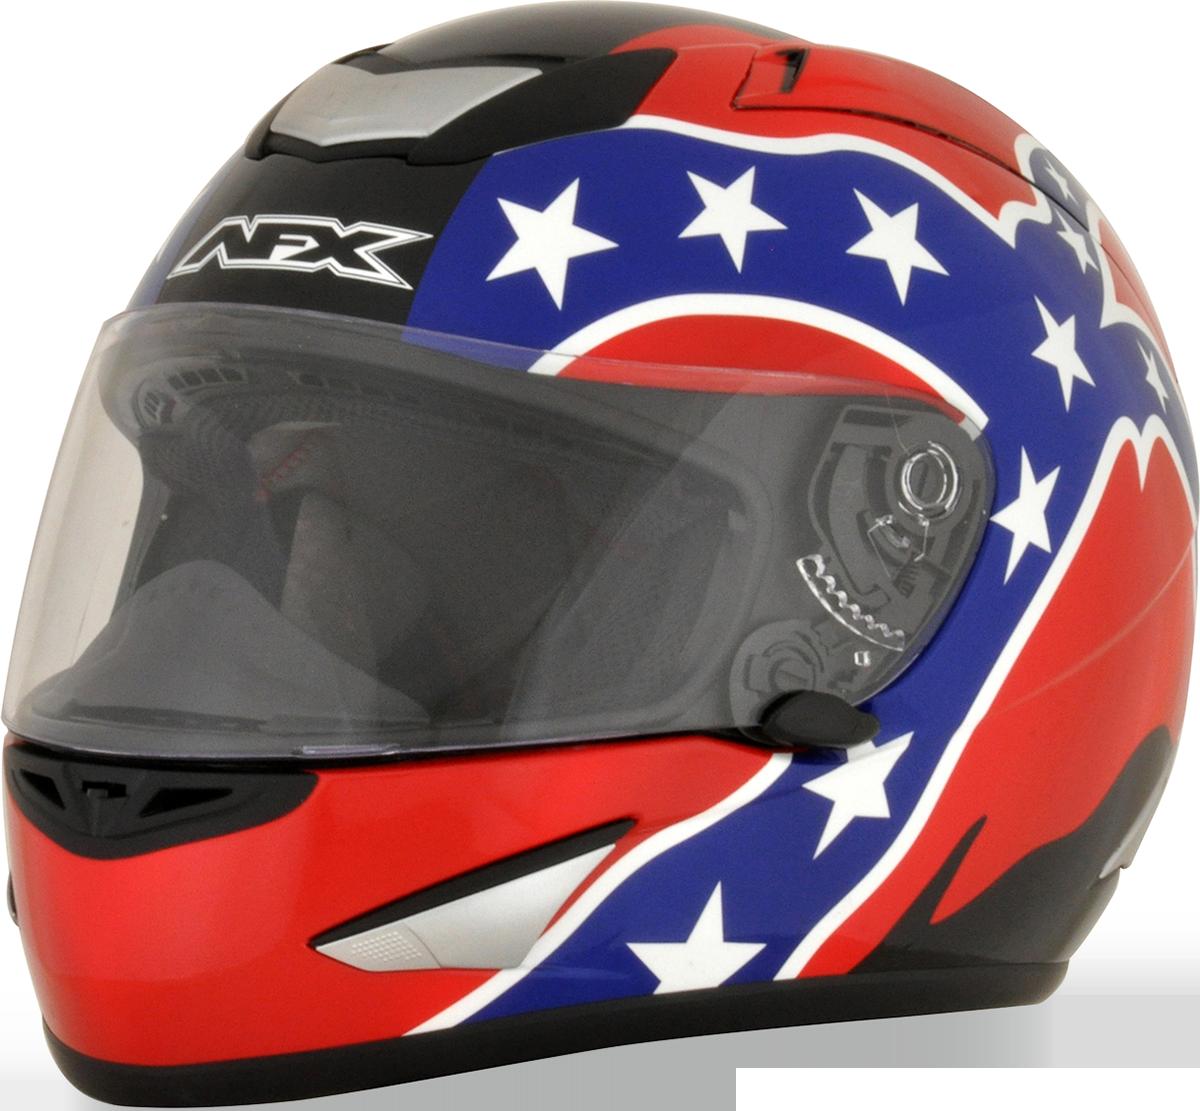 AFX Red Unisex Rebel Flag Motorcycle Full Face Riding Street Racing Helmet